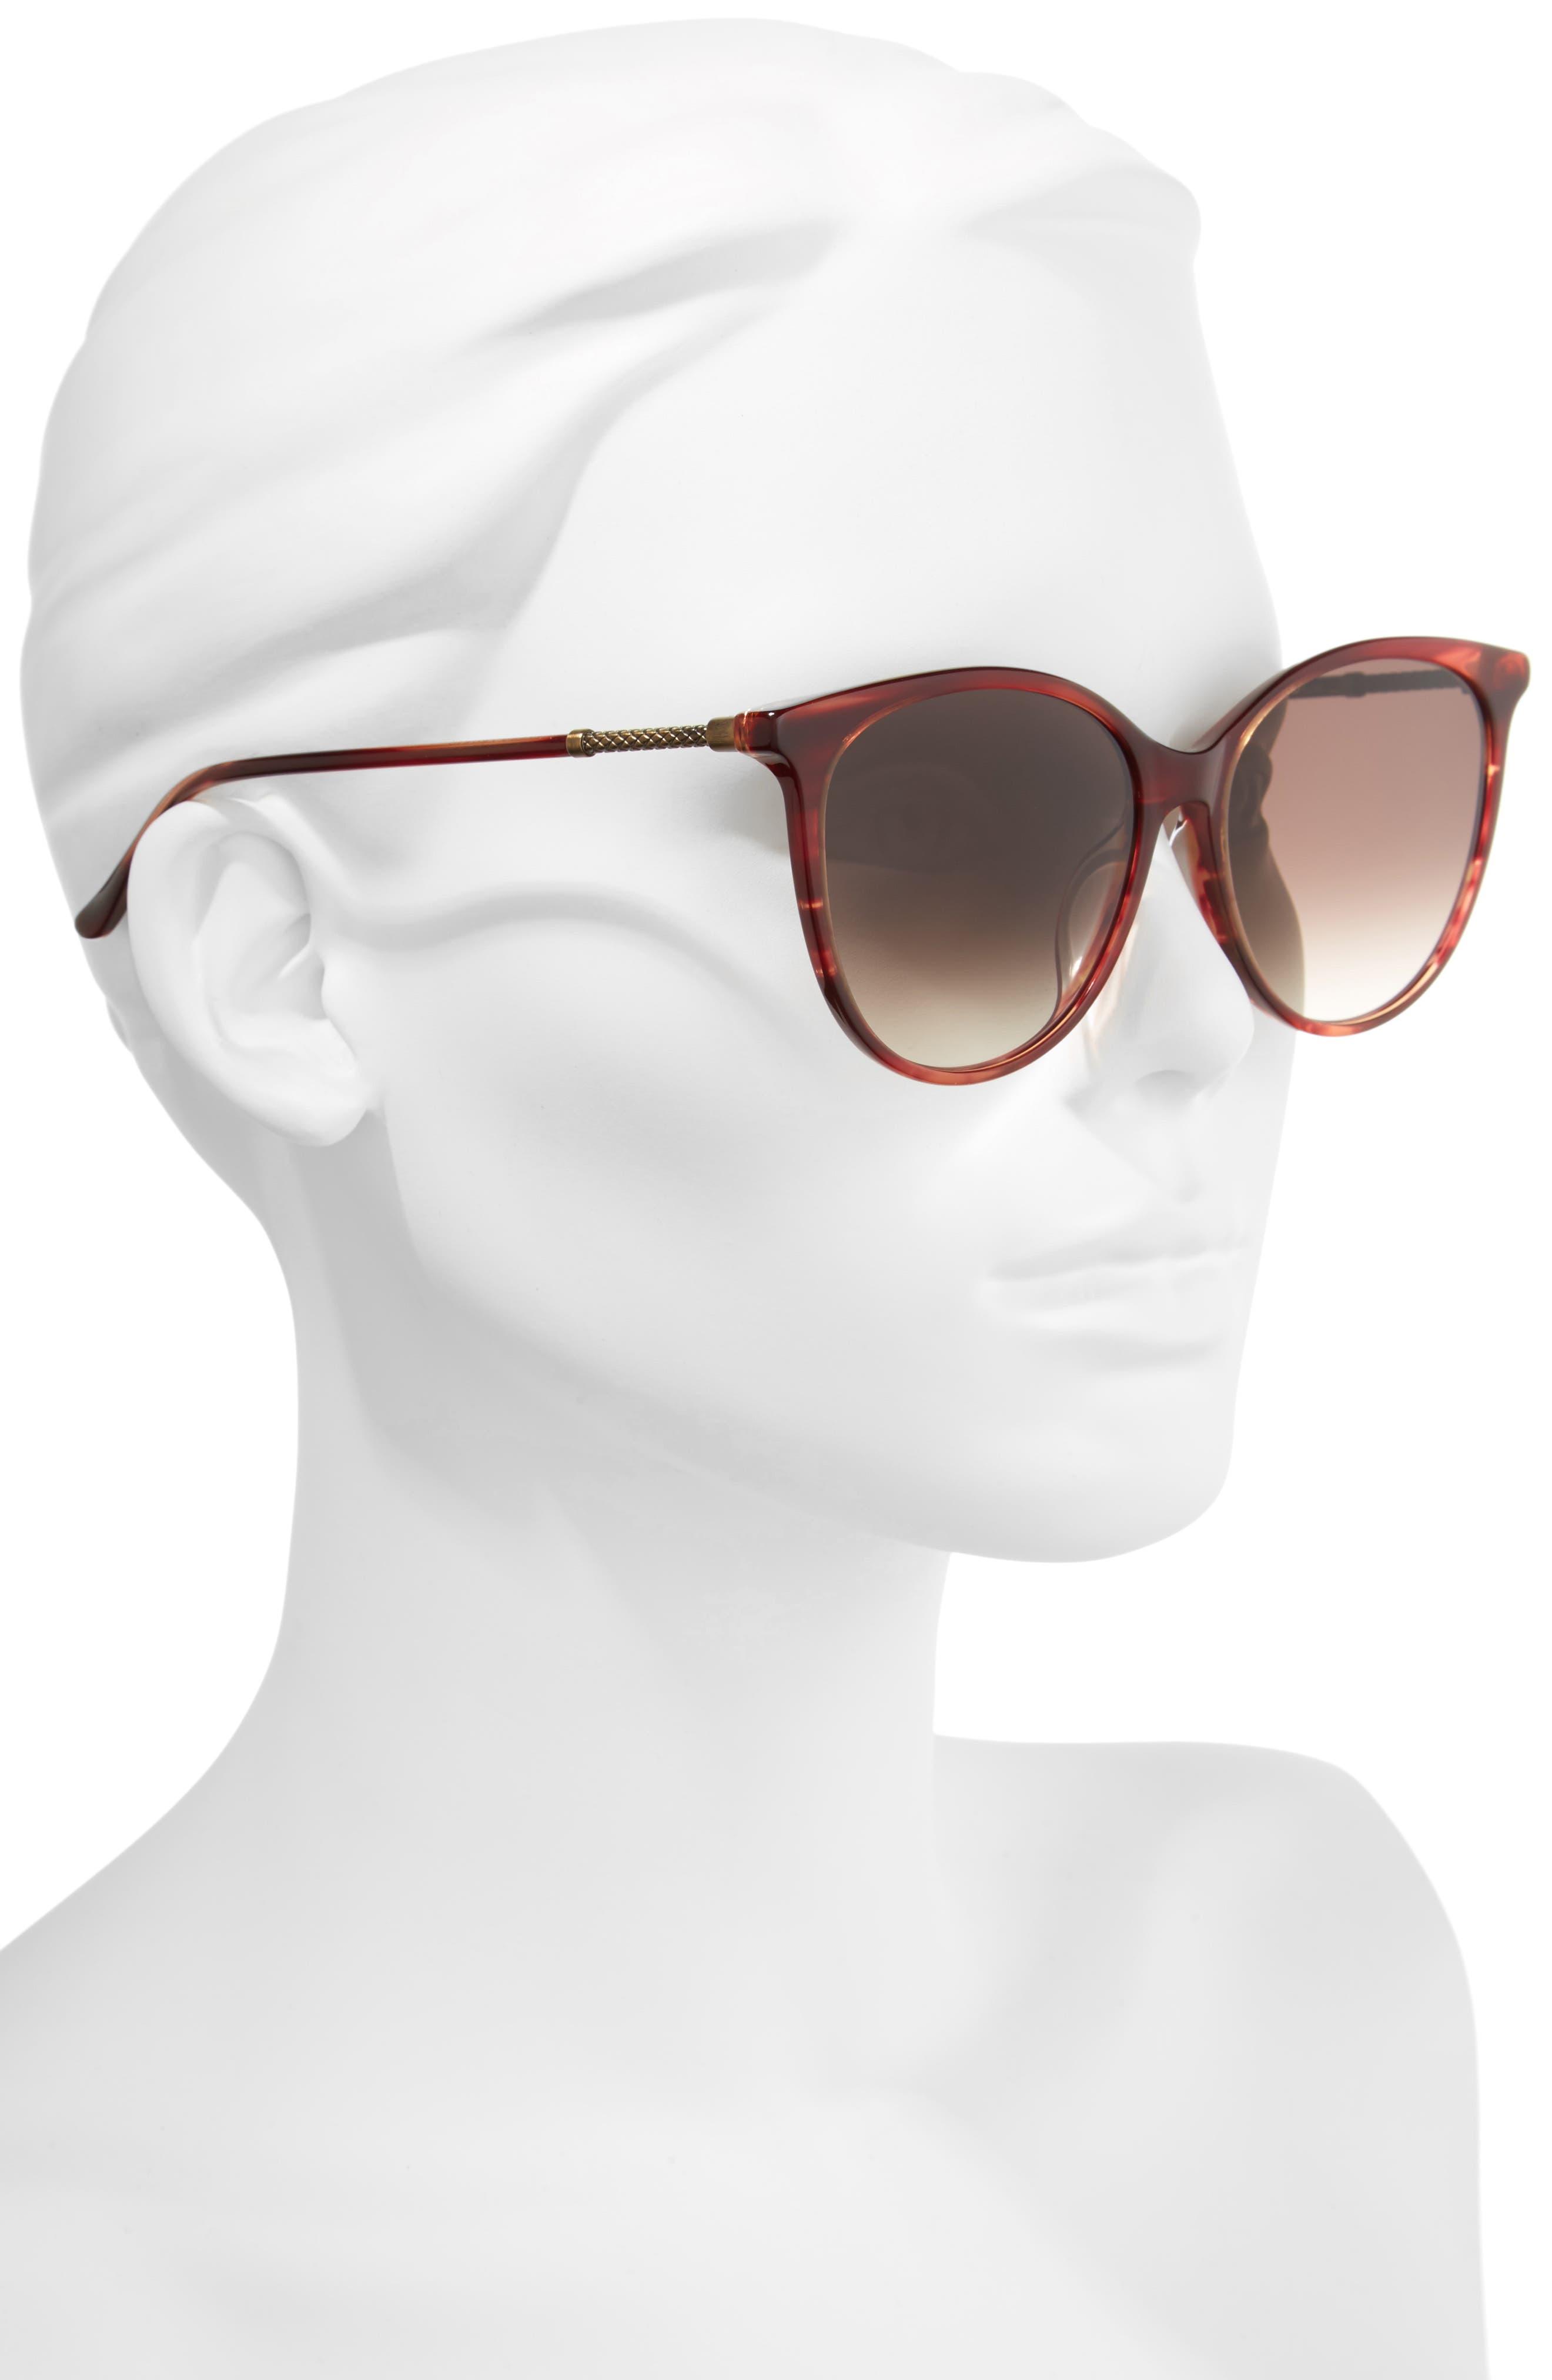 57mm Cat Eye Sunglasses,                             Alternate thumbnail 2, color,                             Red